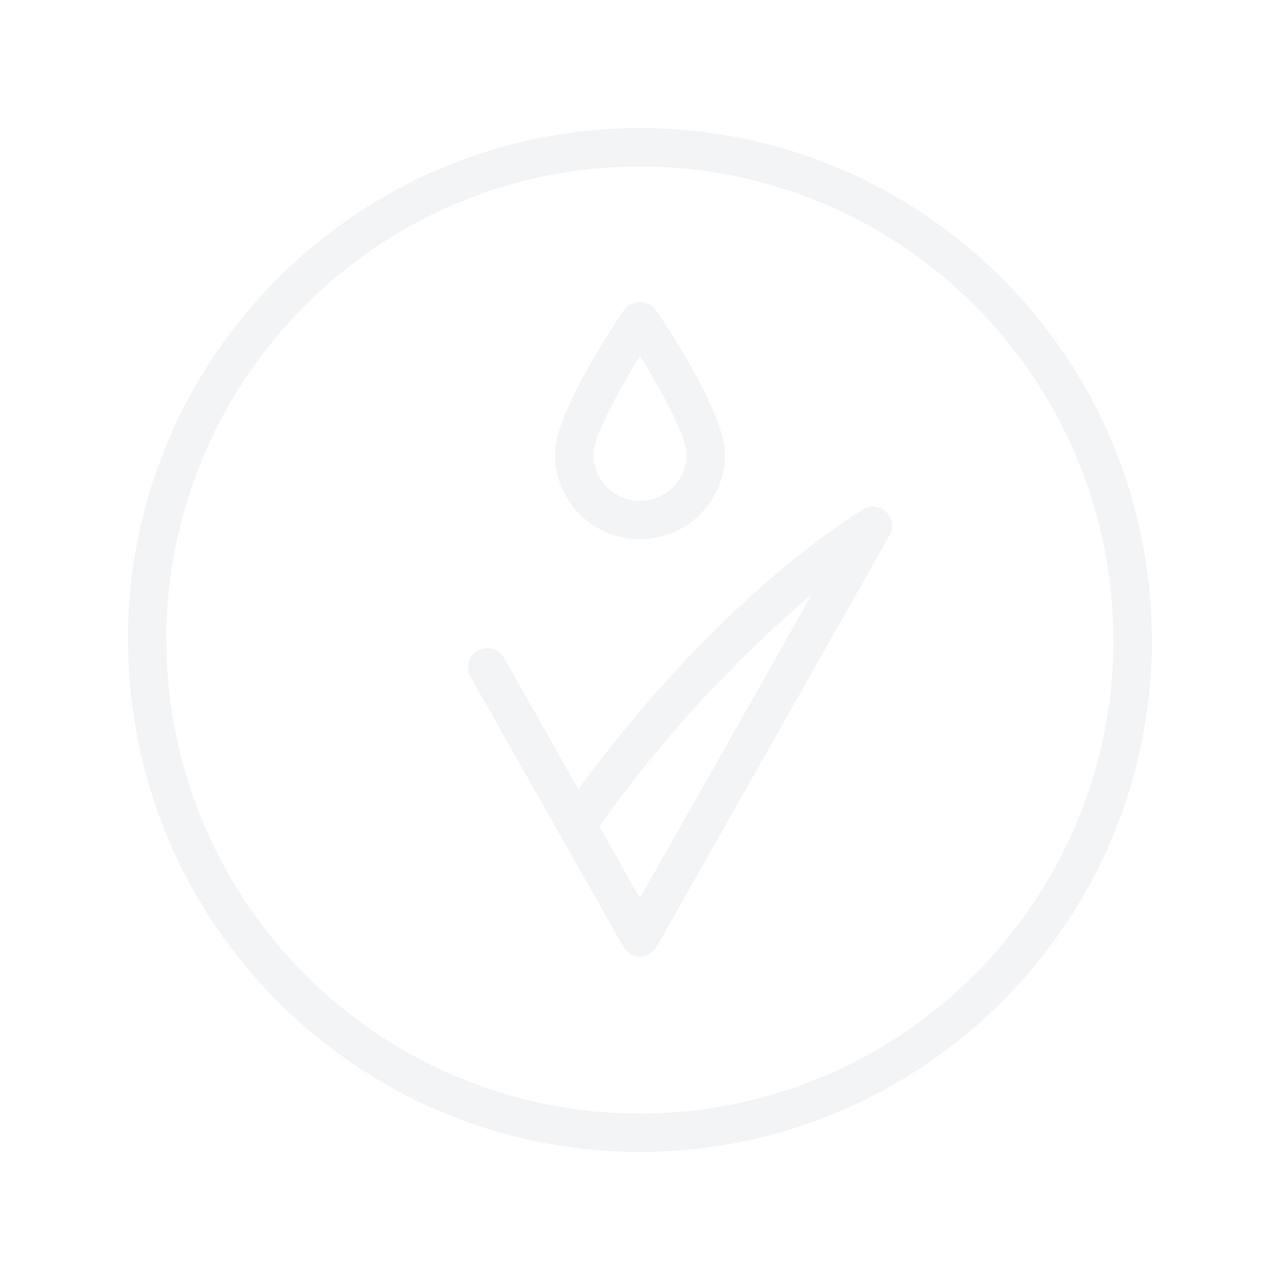 Calvin Klein Eternity Now Men EDT 50ml